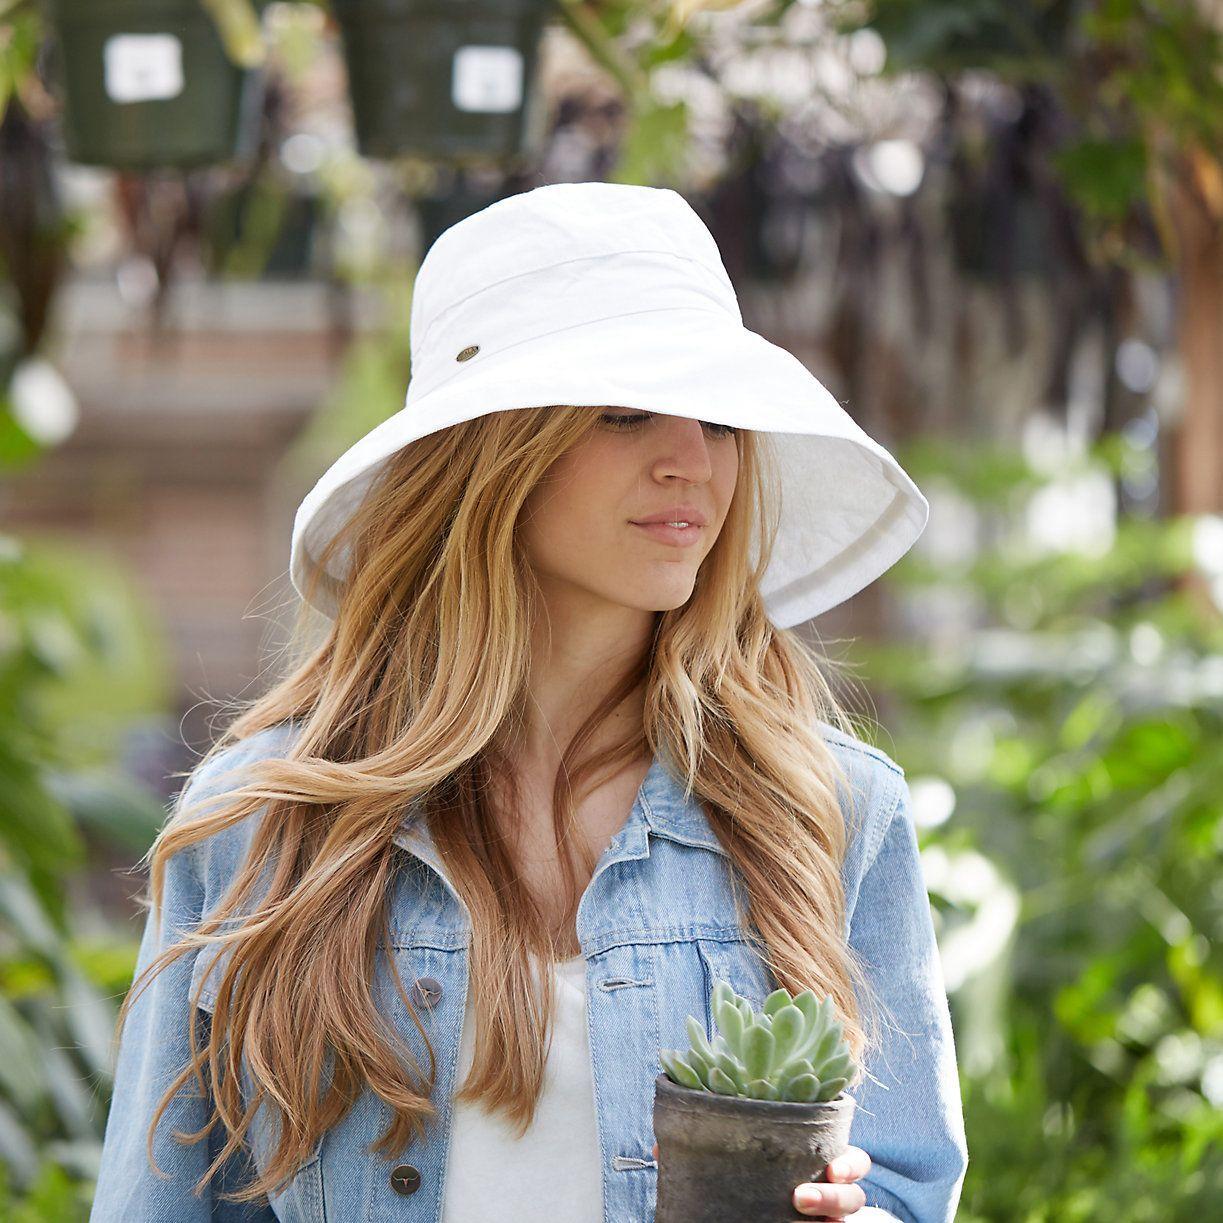 1be5aeb3 Cotton Crusher Hat in Outdoor Living Sunscreen + Hats at Terrain  #sunhatsforwomenbeach